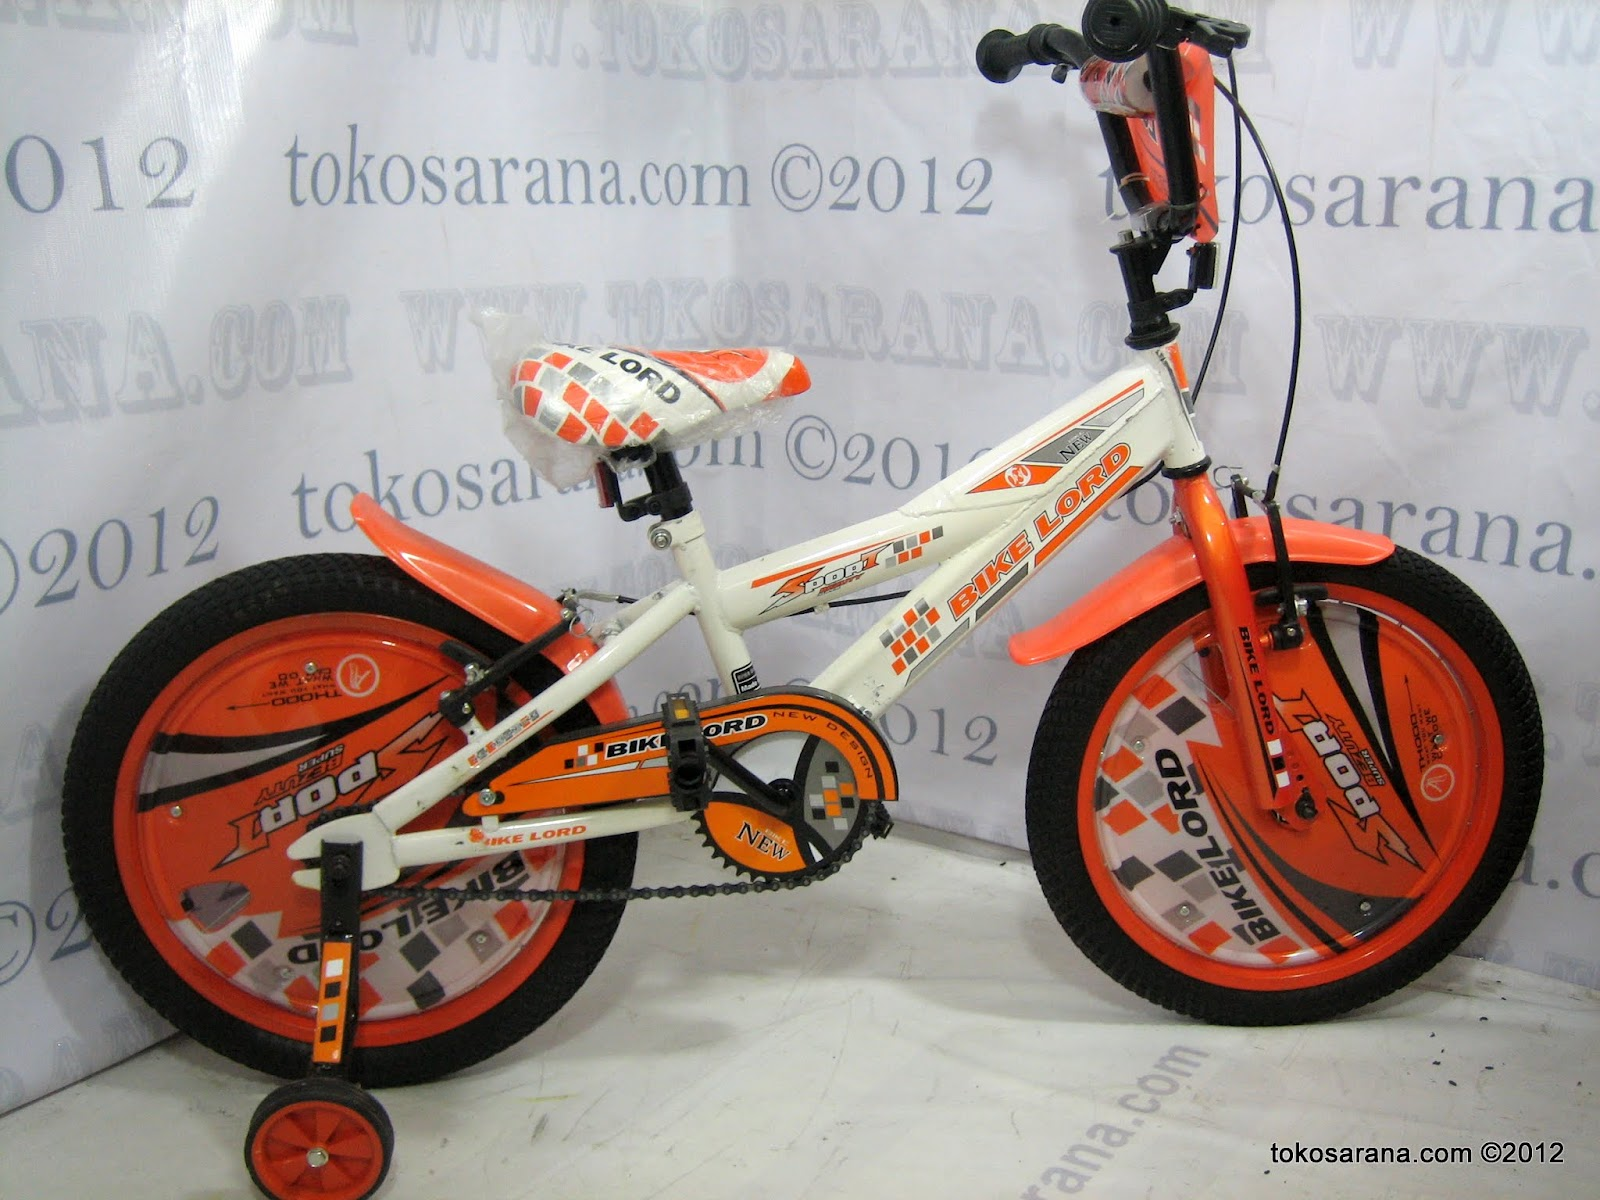 TokosaranaTMJakarta Jatinegara Sepeda Anak Bike Lord 1809W